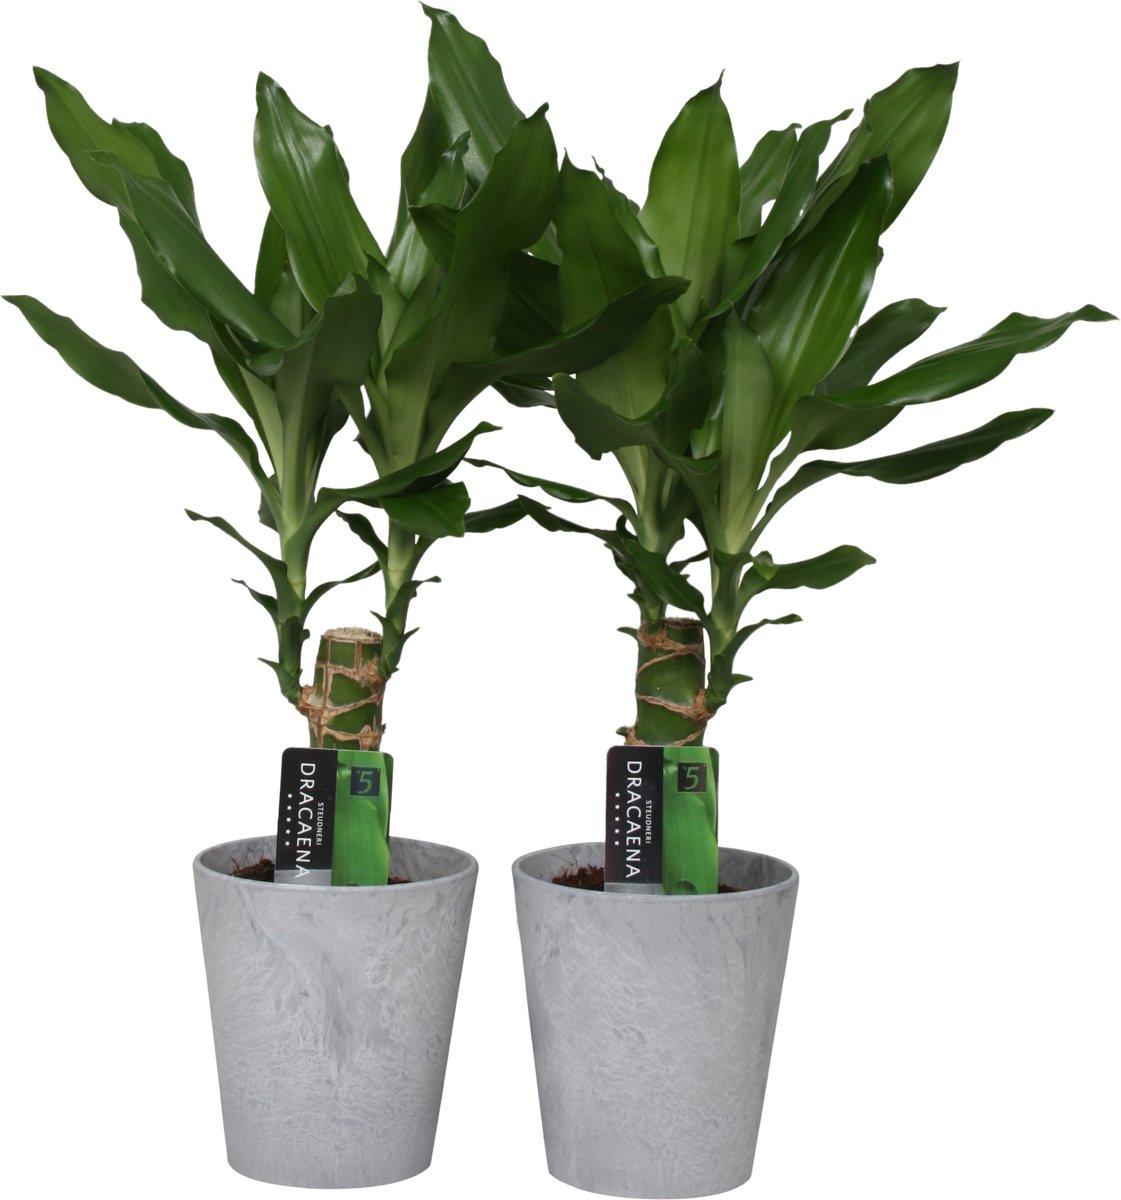 Drakenbloemboom - Dracaena; Steudneri; pot 11 cm; keramiek pot; hoogte 40cm; 2 stuks kopen